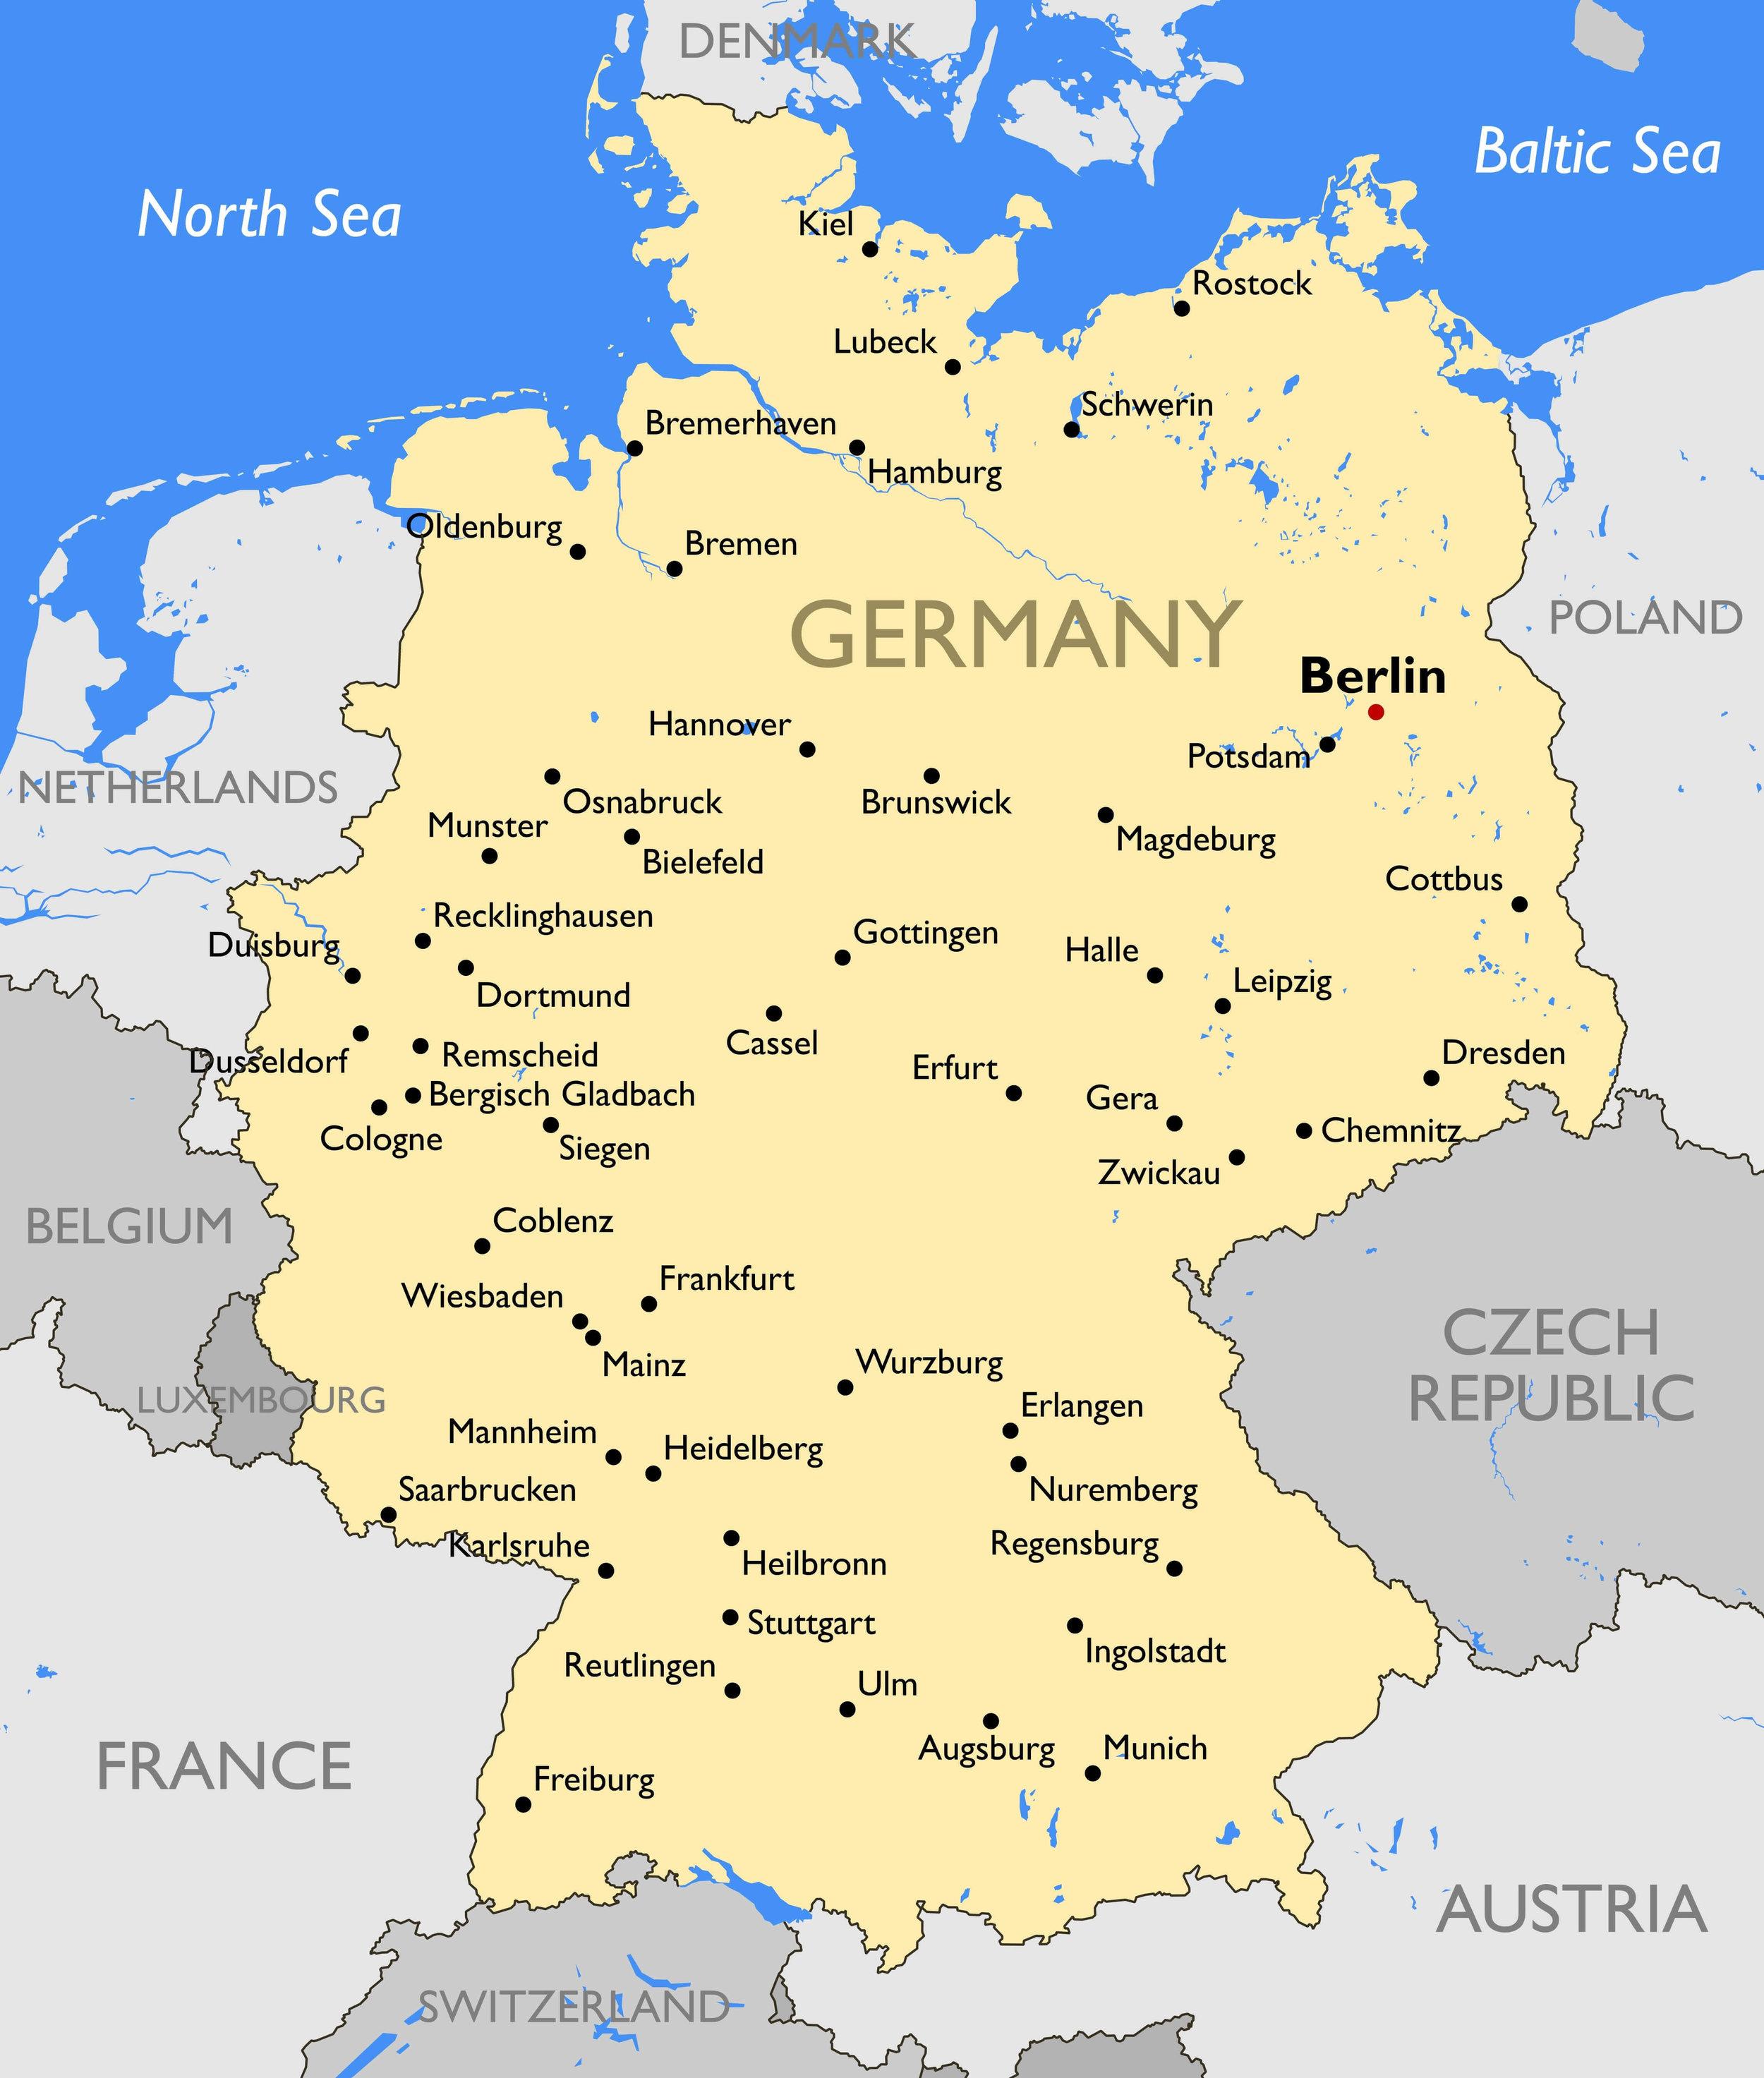 germany_cities_map.jpg